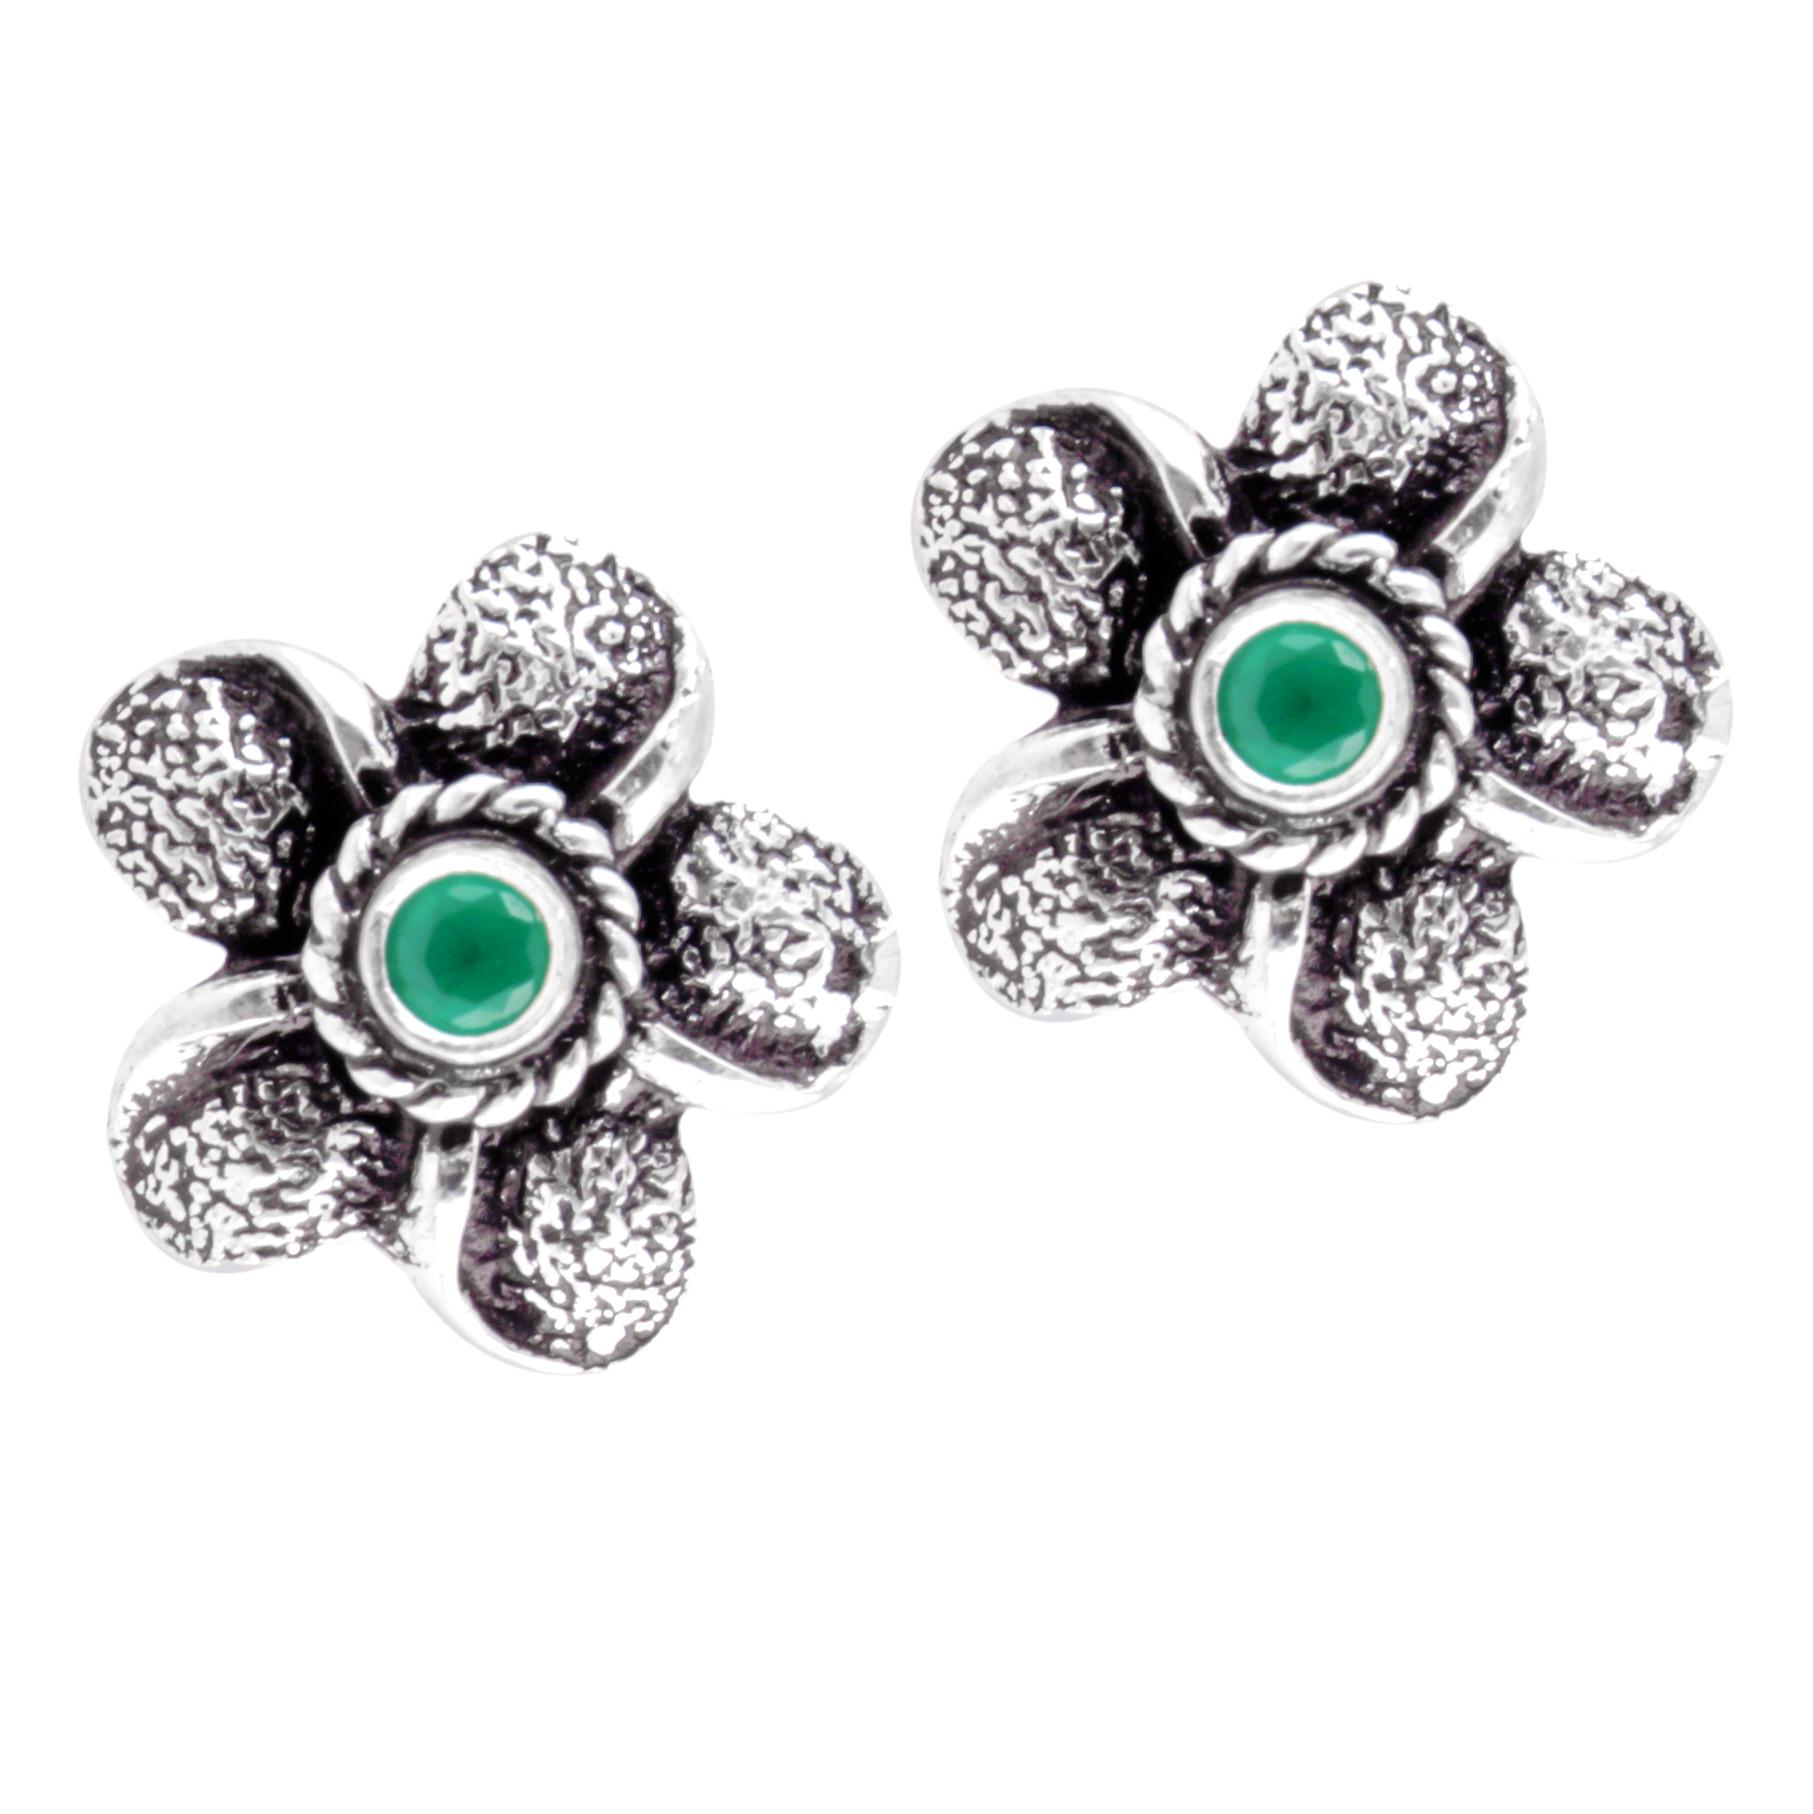 glittering silver oixidised green onyx handmade studs